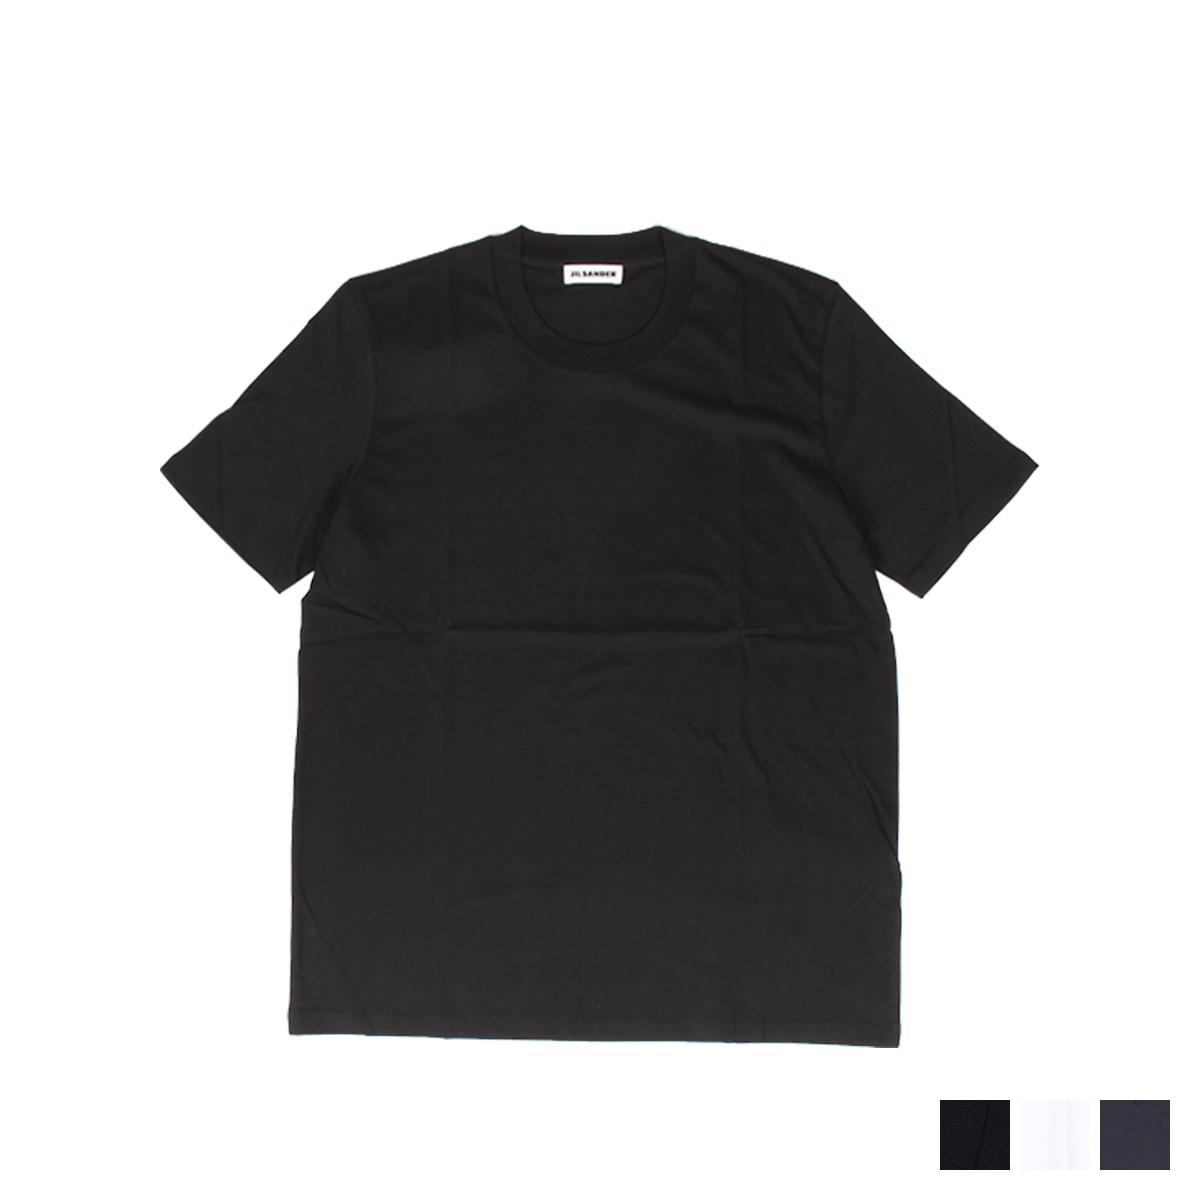 JIL SANDER CREW NECK T-SHIRT ジルサンダー Tシャツ メンズ レディース 半袖 カットソー 無地 ブラック ホワイト ダーク ブルー 黒 白 JSMP706020 MP247308 [予約商品 9/2頃入荷予定 新入荷] [198]